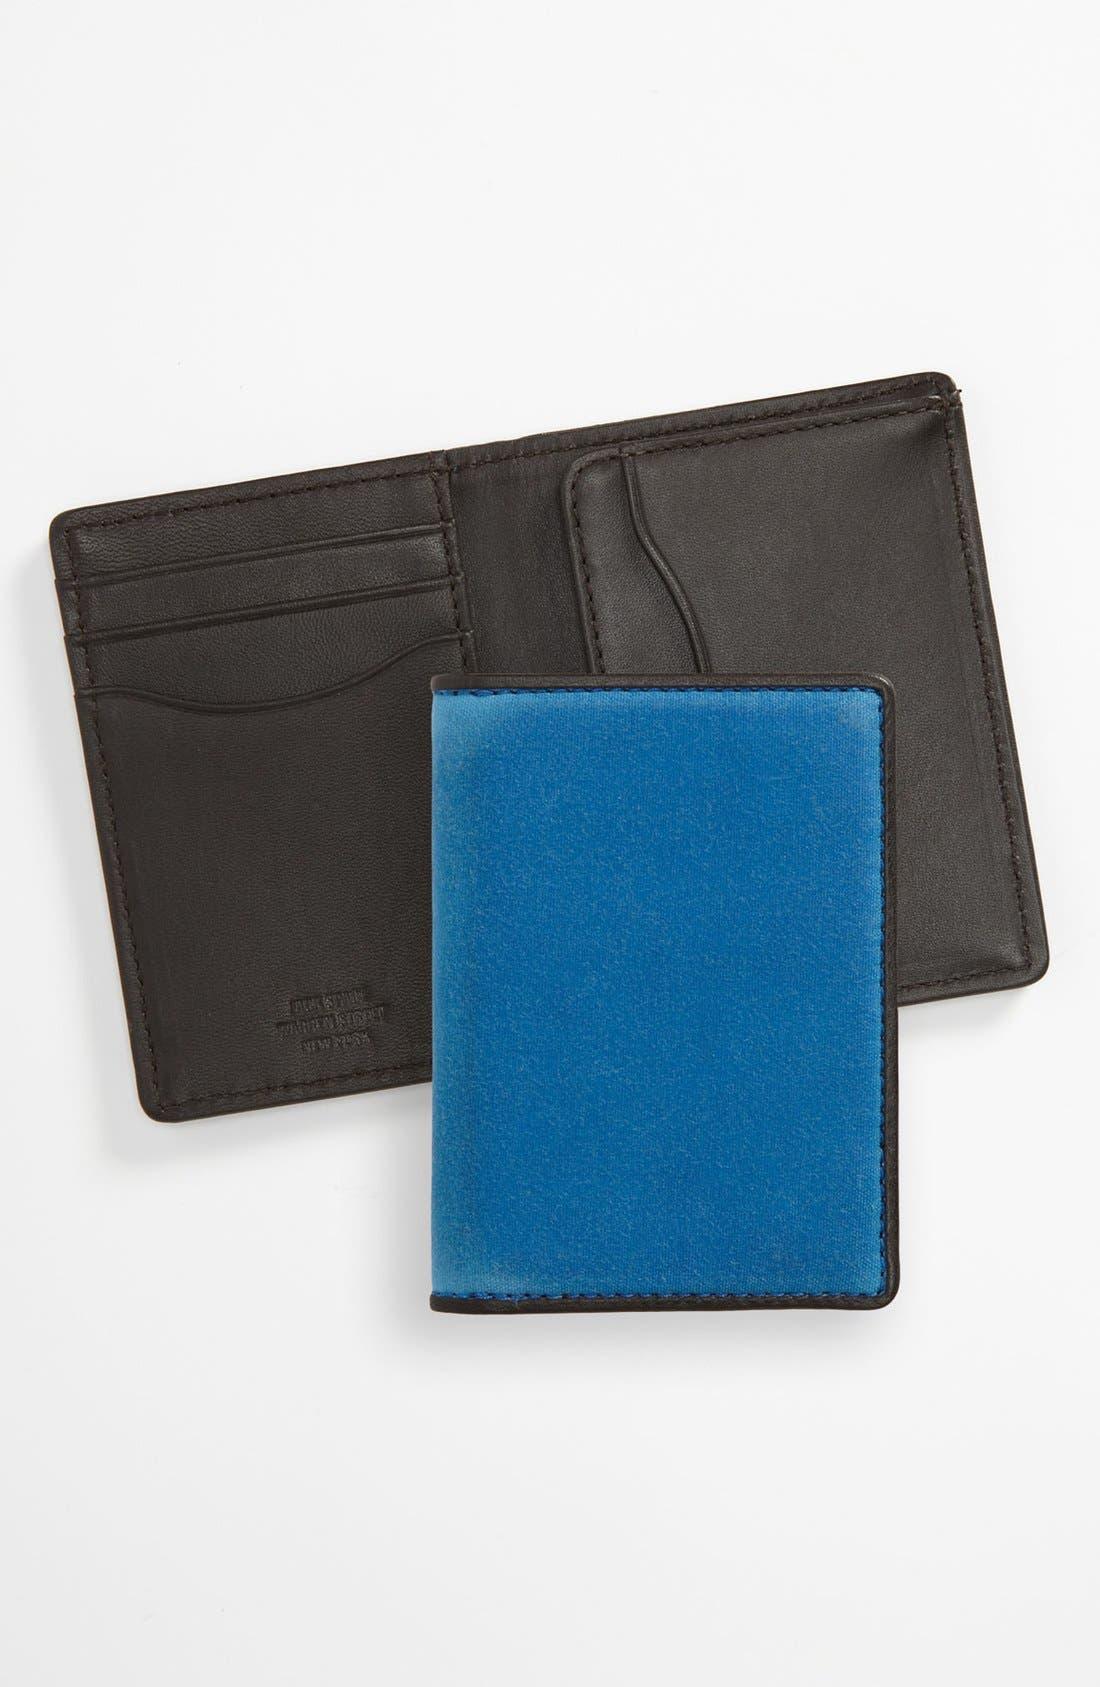 Main Image - Jack Spade 'Waxwear' Vertical Wallet